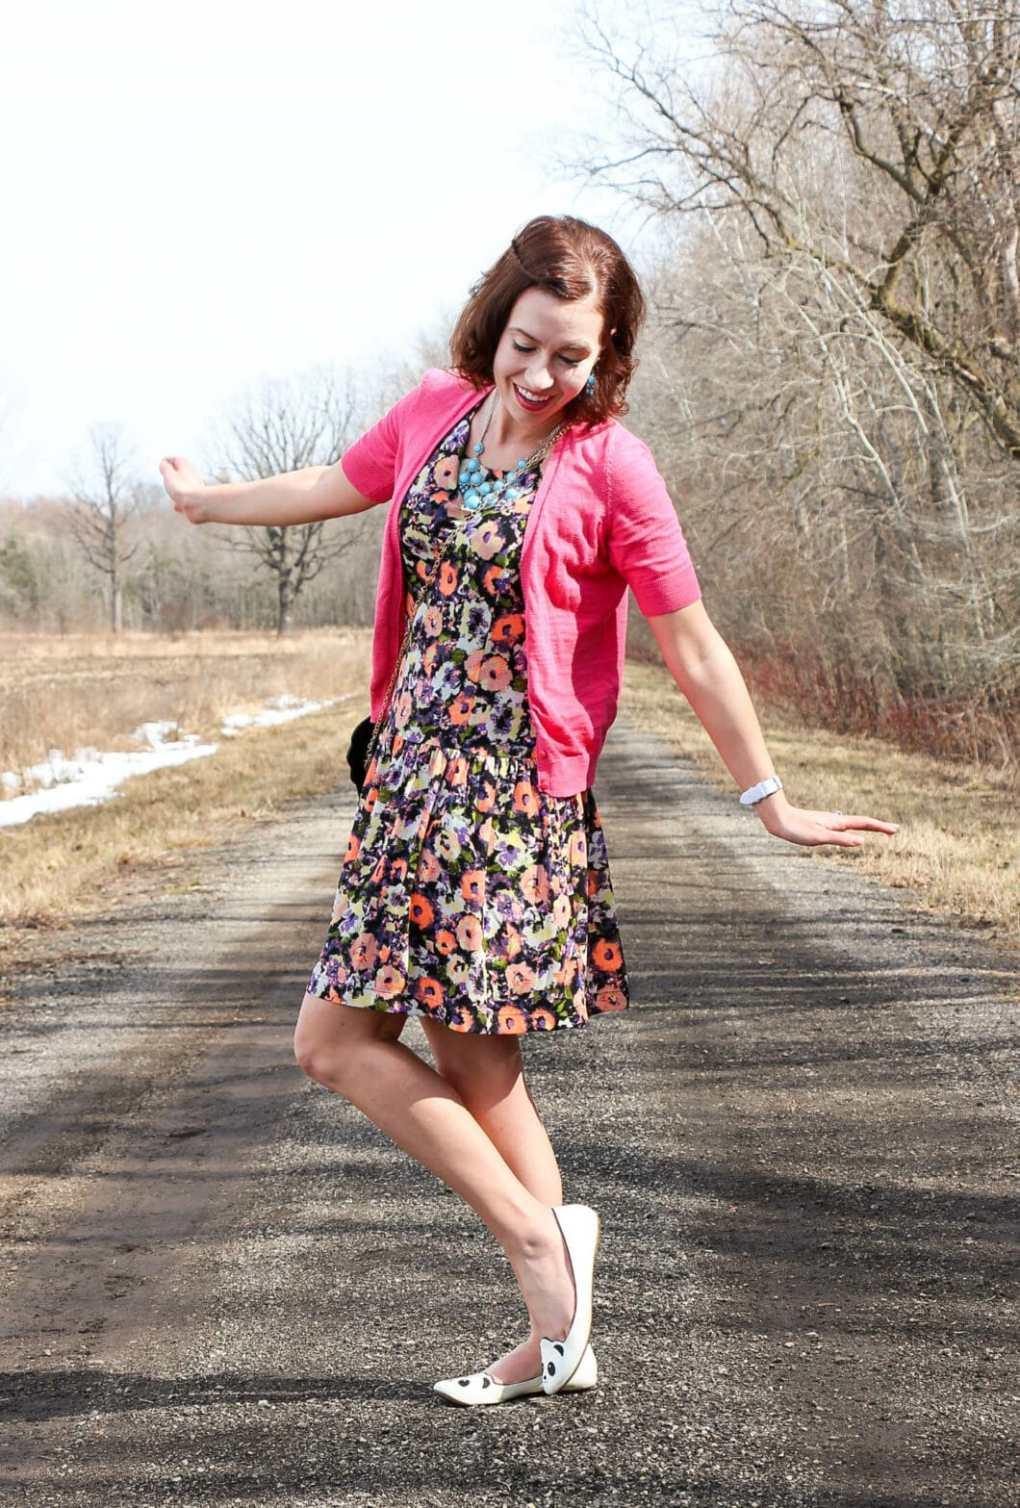 thredUP Spring Capsule Wardrobe